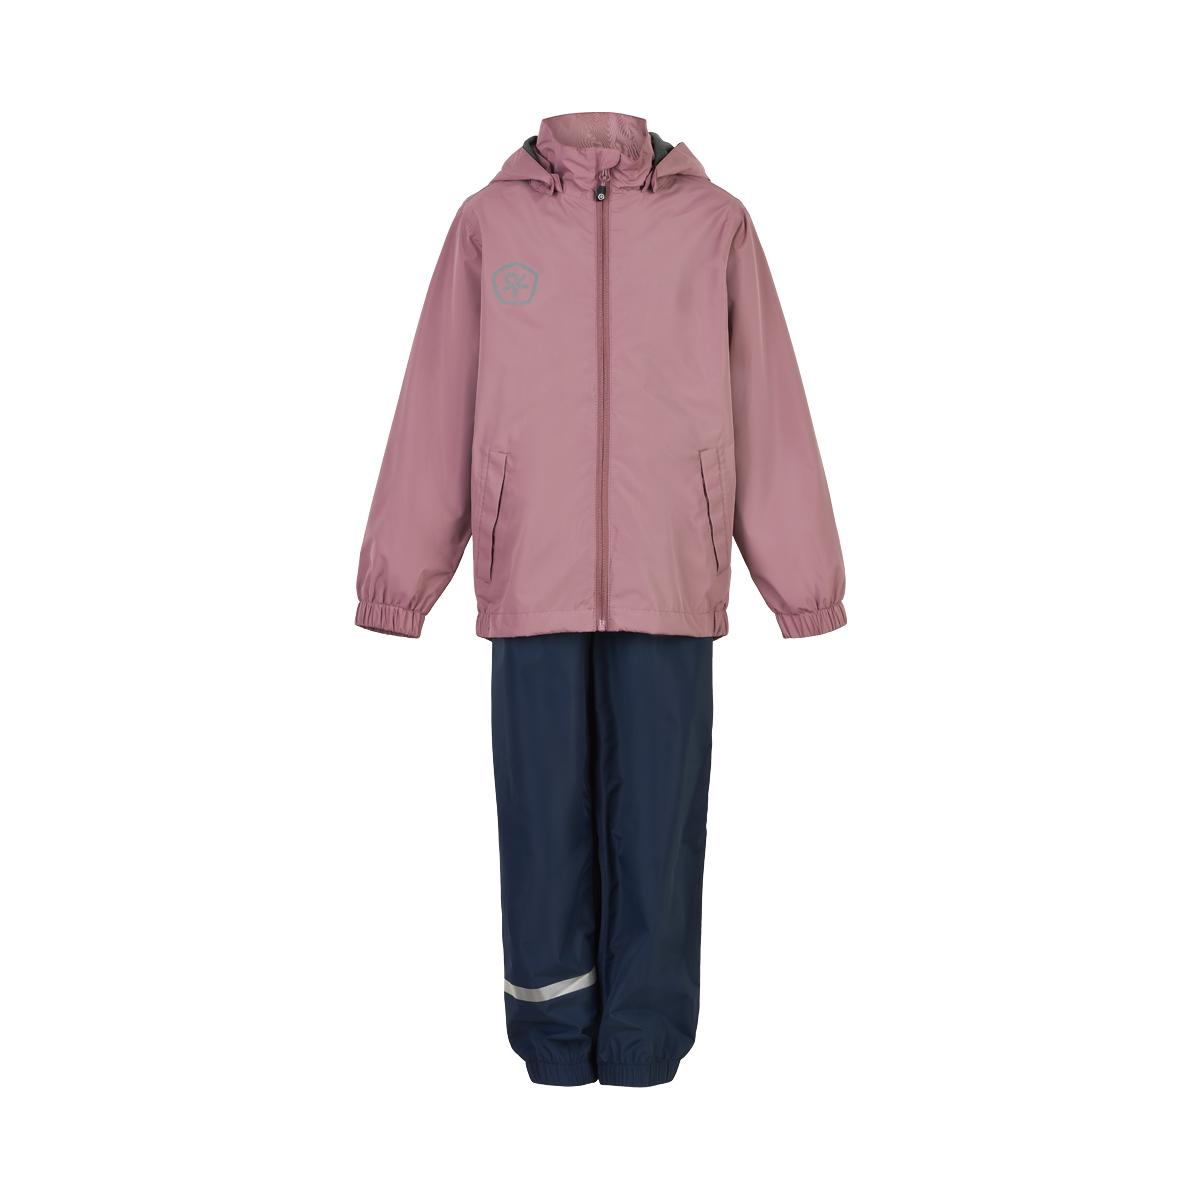 Color Kids dívčí oblek do deště AF 5000  104625-4199